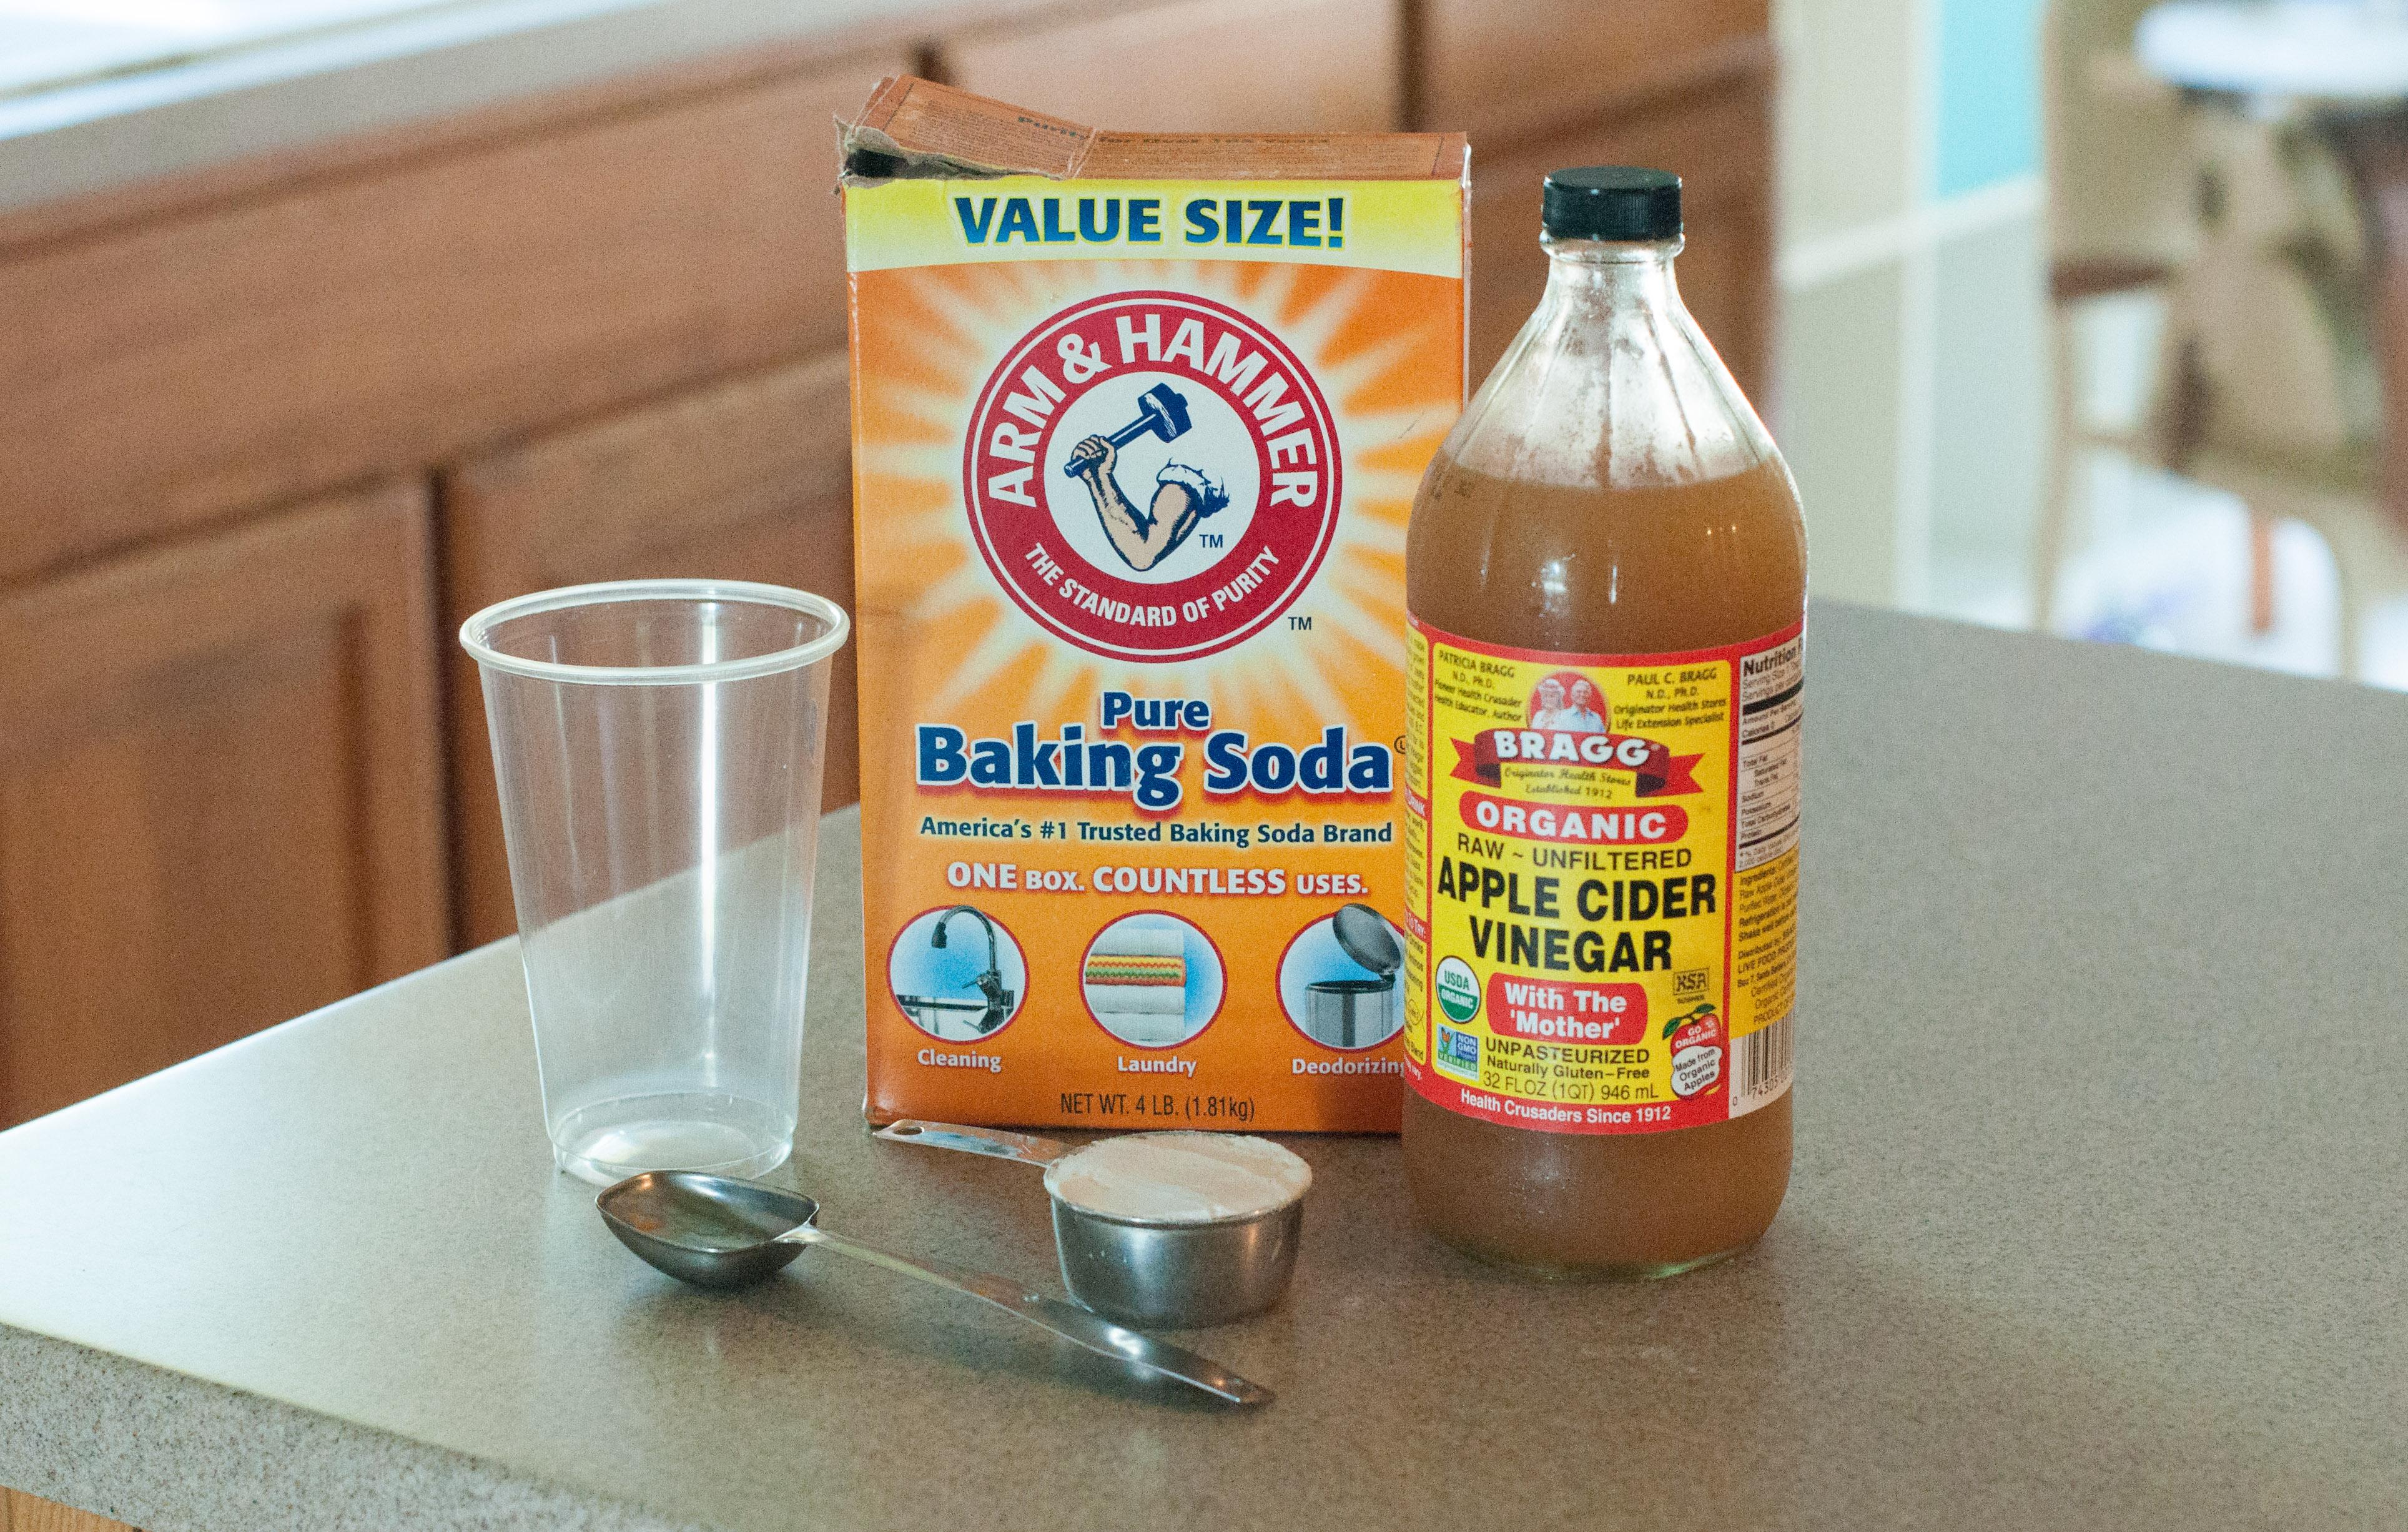 Recipe: Natural Hair Care Baking Soda + Apple Cider Vinegar